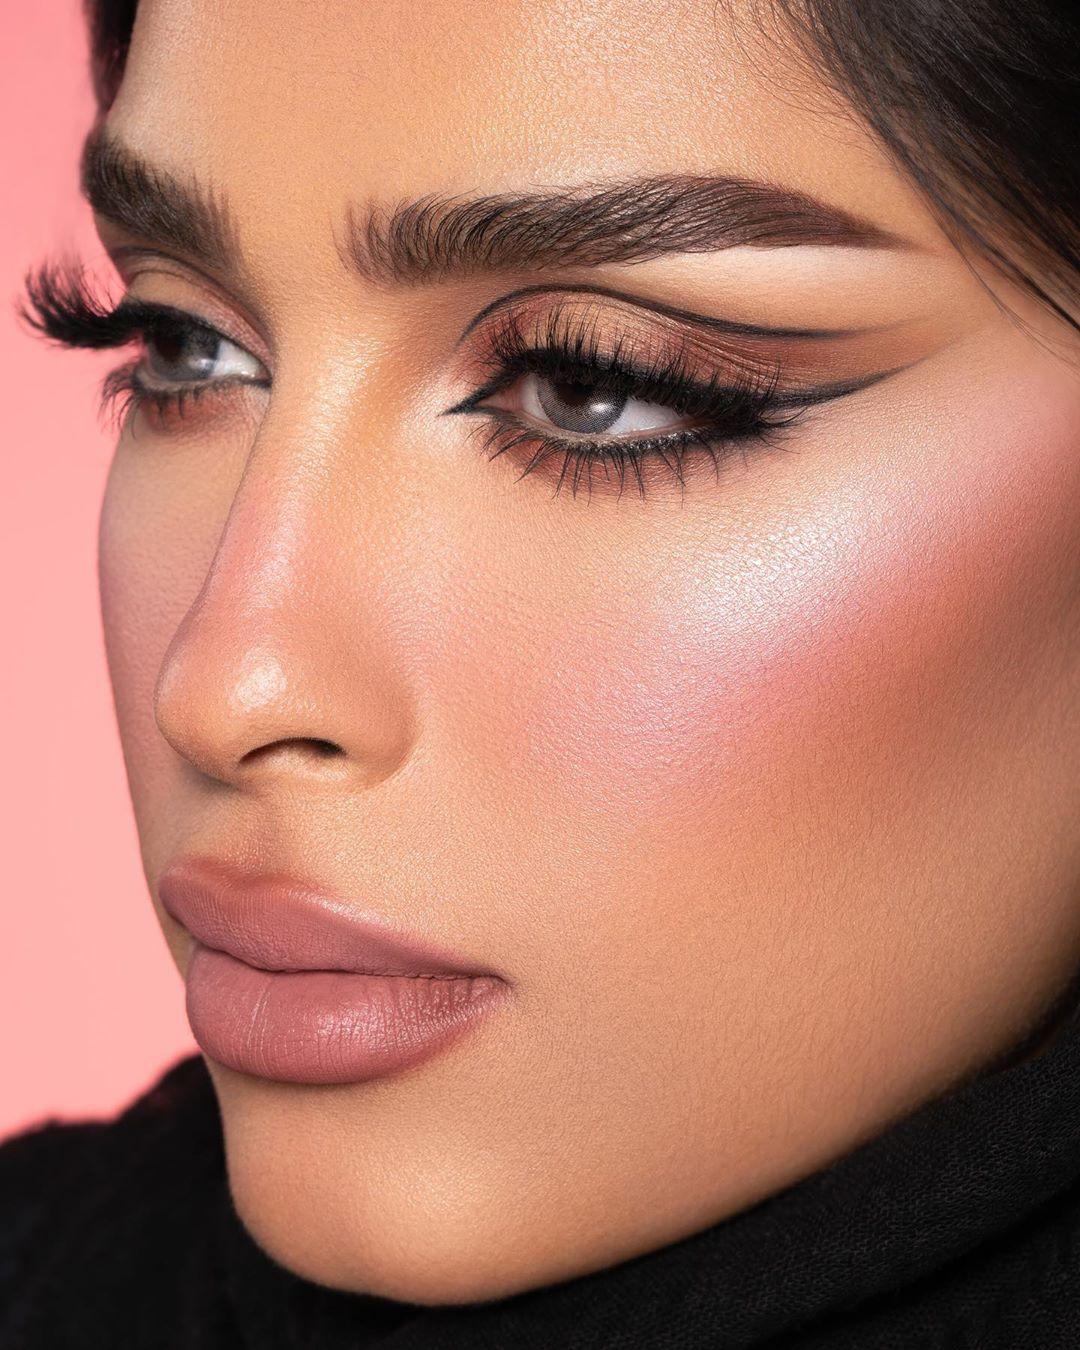 معصومة هاشم Masooma Jaleel On Instagram تصوير صوفيا Safa Photographer فاونديشن ميكب فور ايڤر الترا اچ دي In 2020 Makeup Eye Looks Eye Makeup Makeup Looks